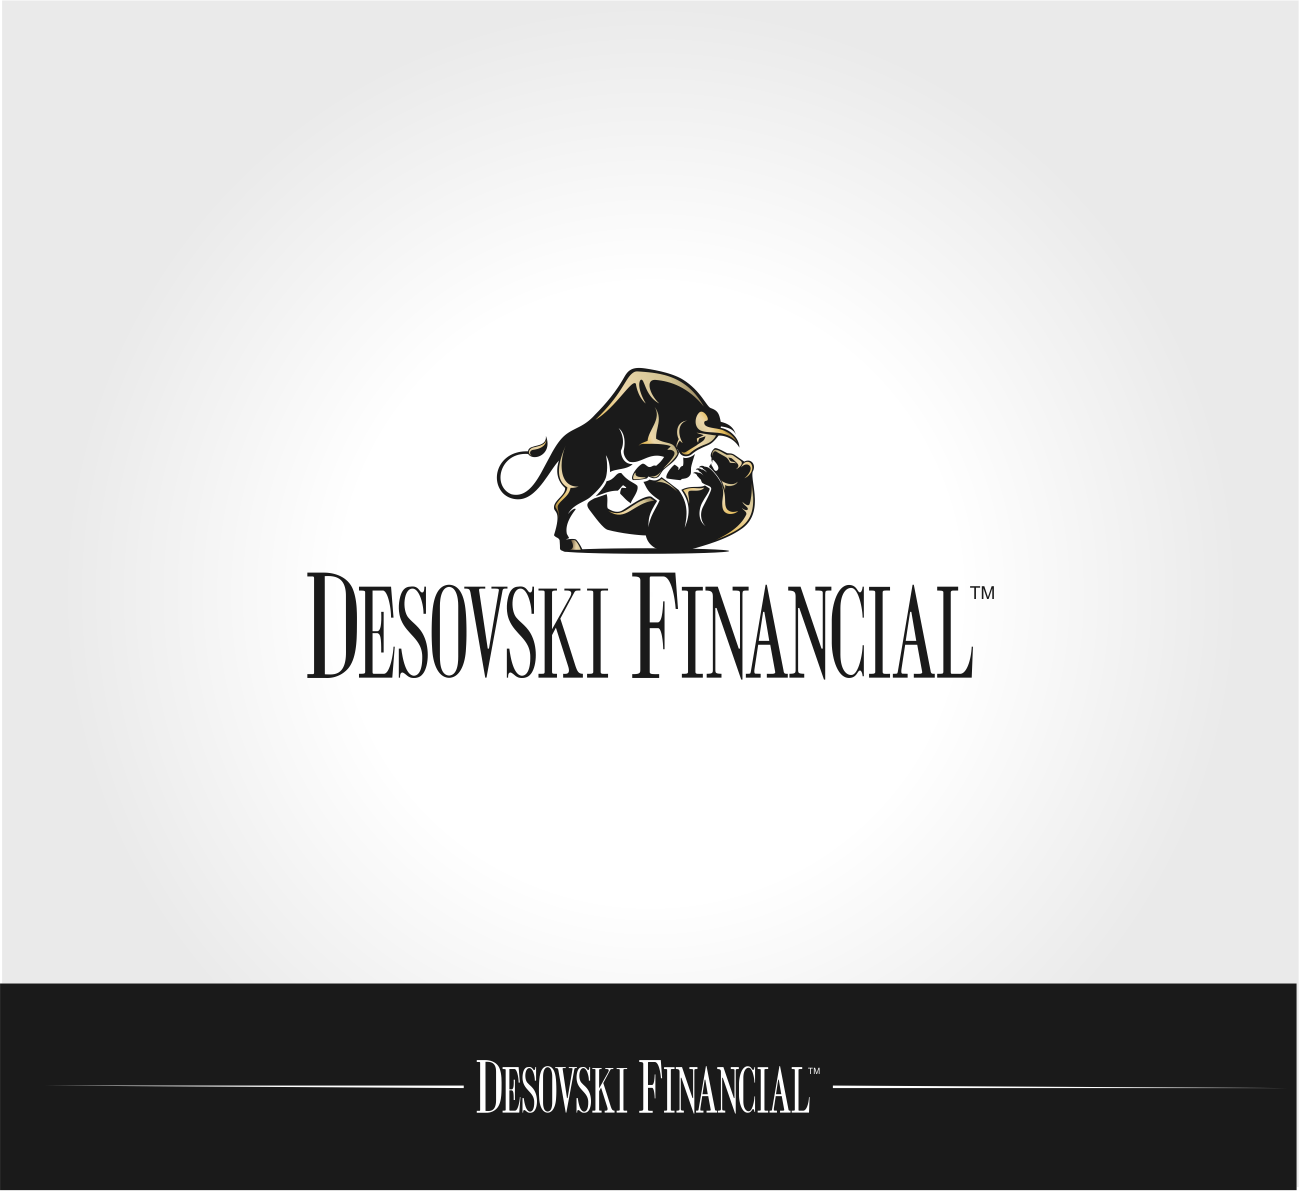 Desovski Financial needs a new logo